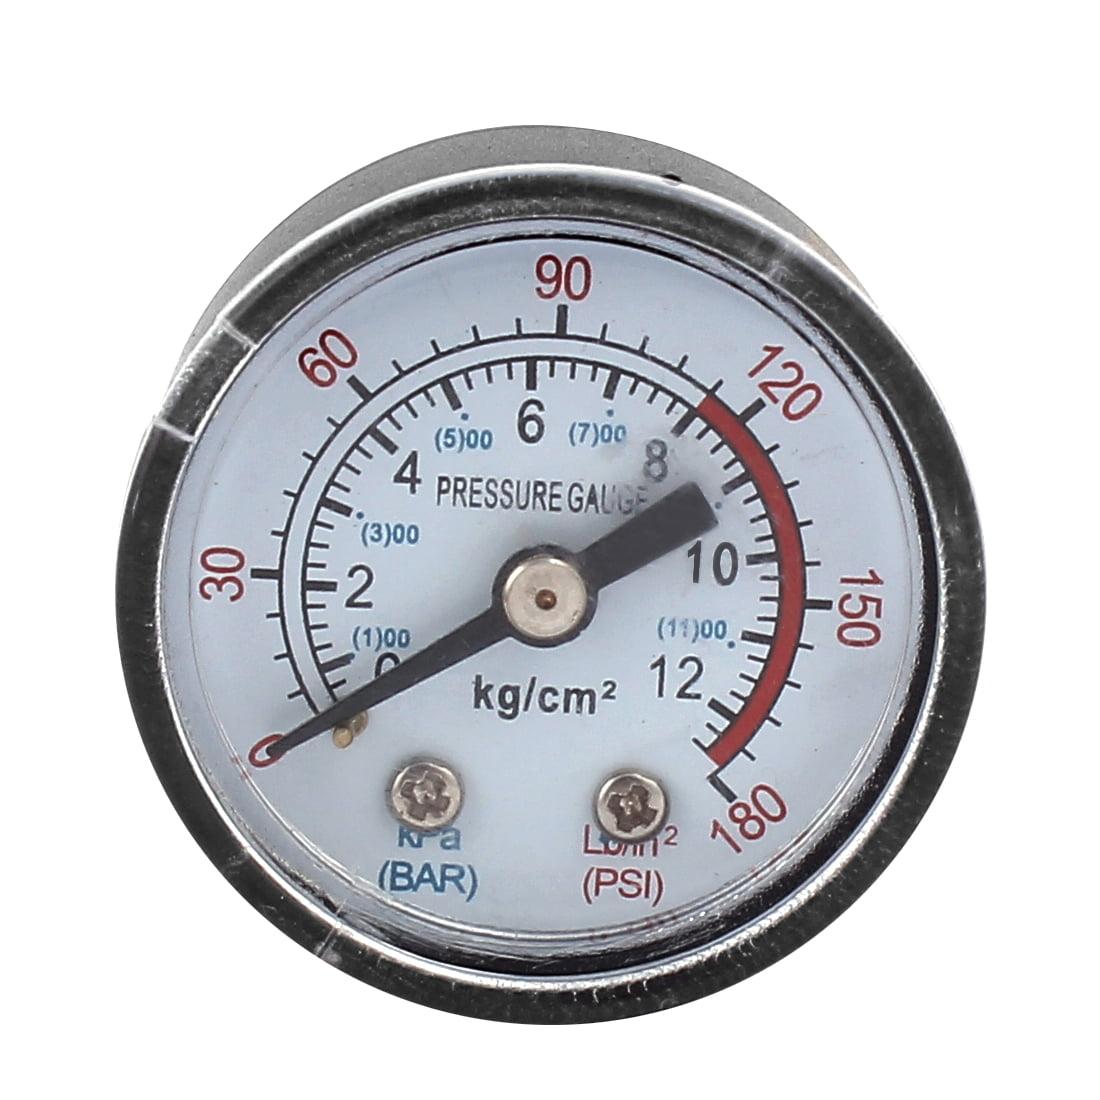 Unique Bargains 1/8BSP Thread Dia Air Compressor Barometer Measurement Tool 0-12KPa 0-180 Psi